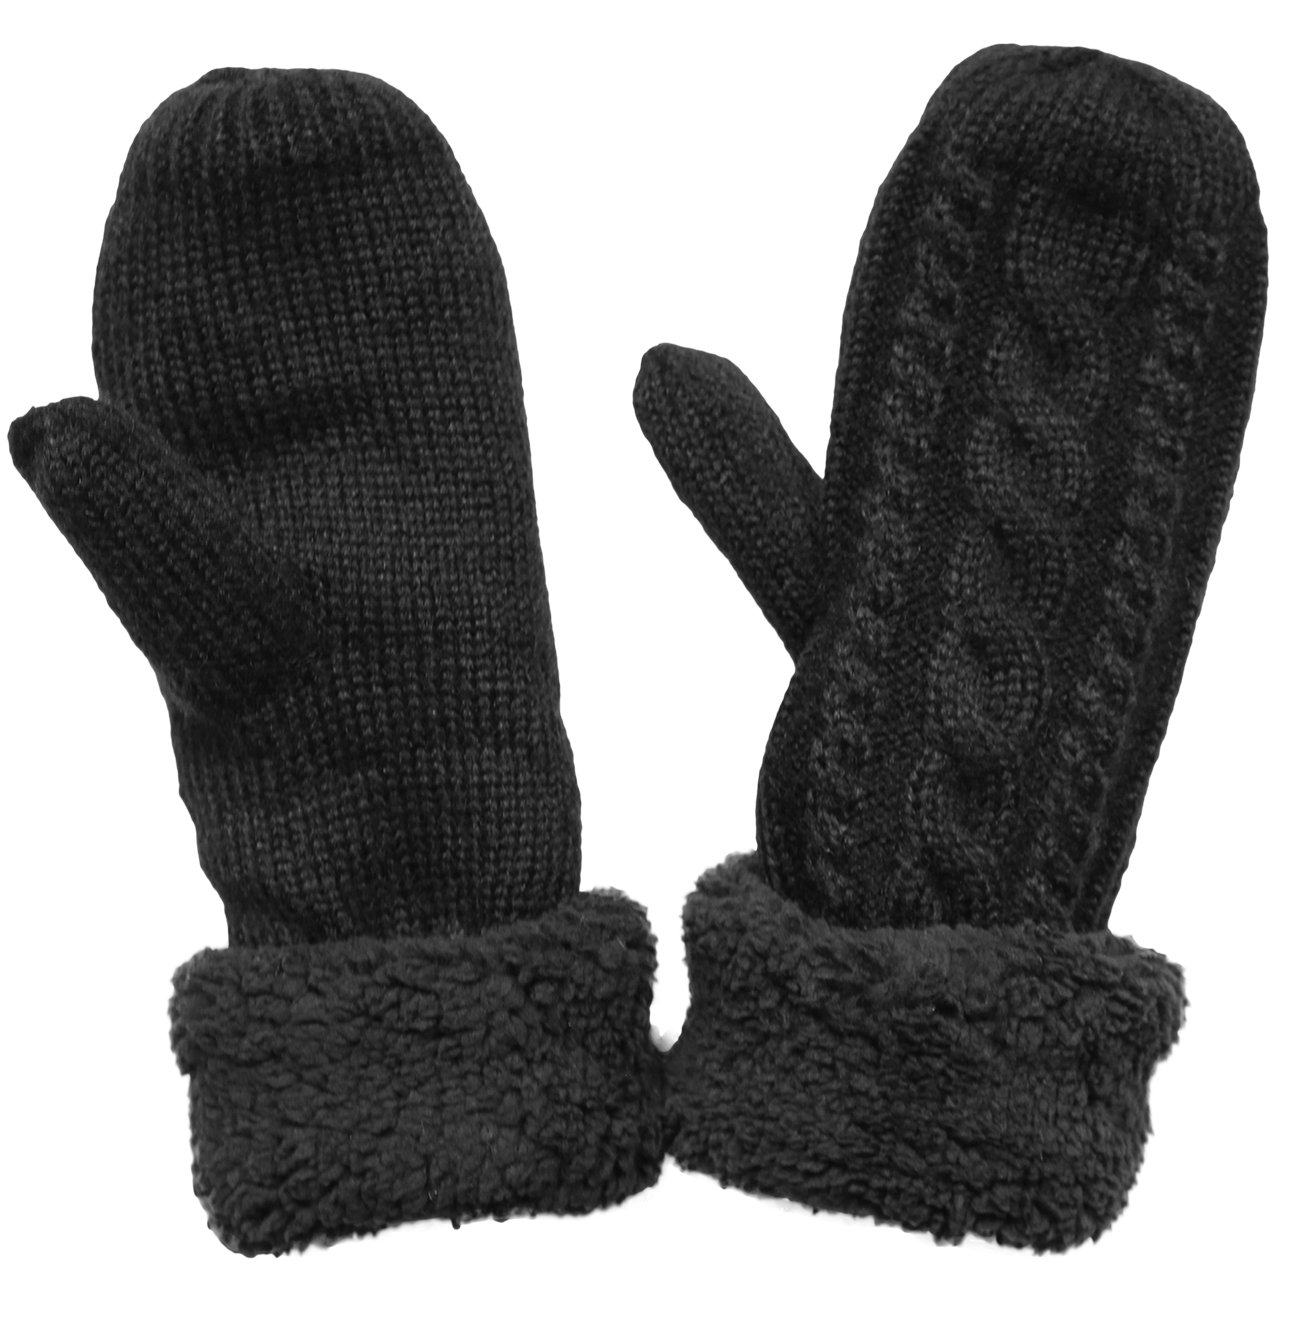 KMystic Plush Lined Cuffed Winter Knit Mittens (Black), One Size